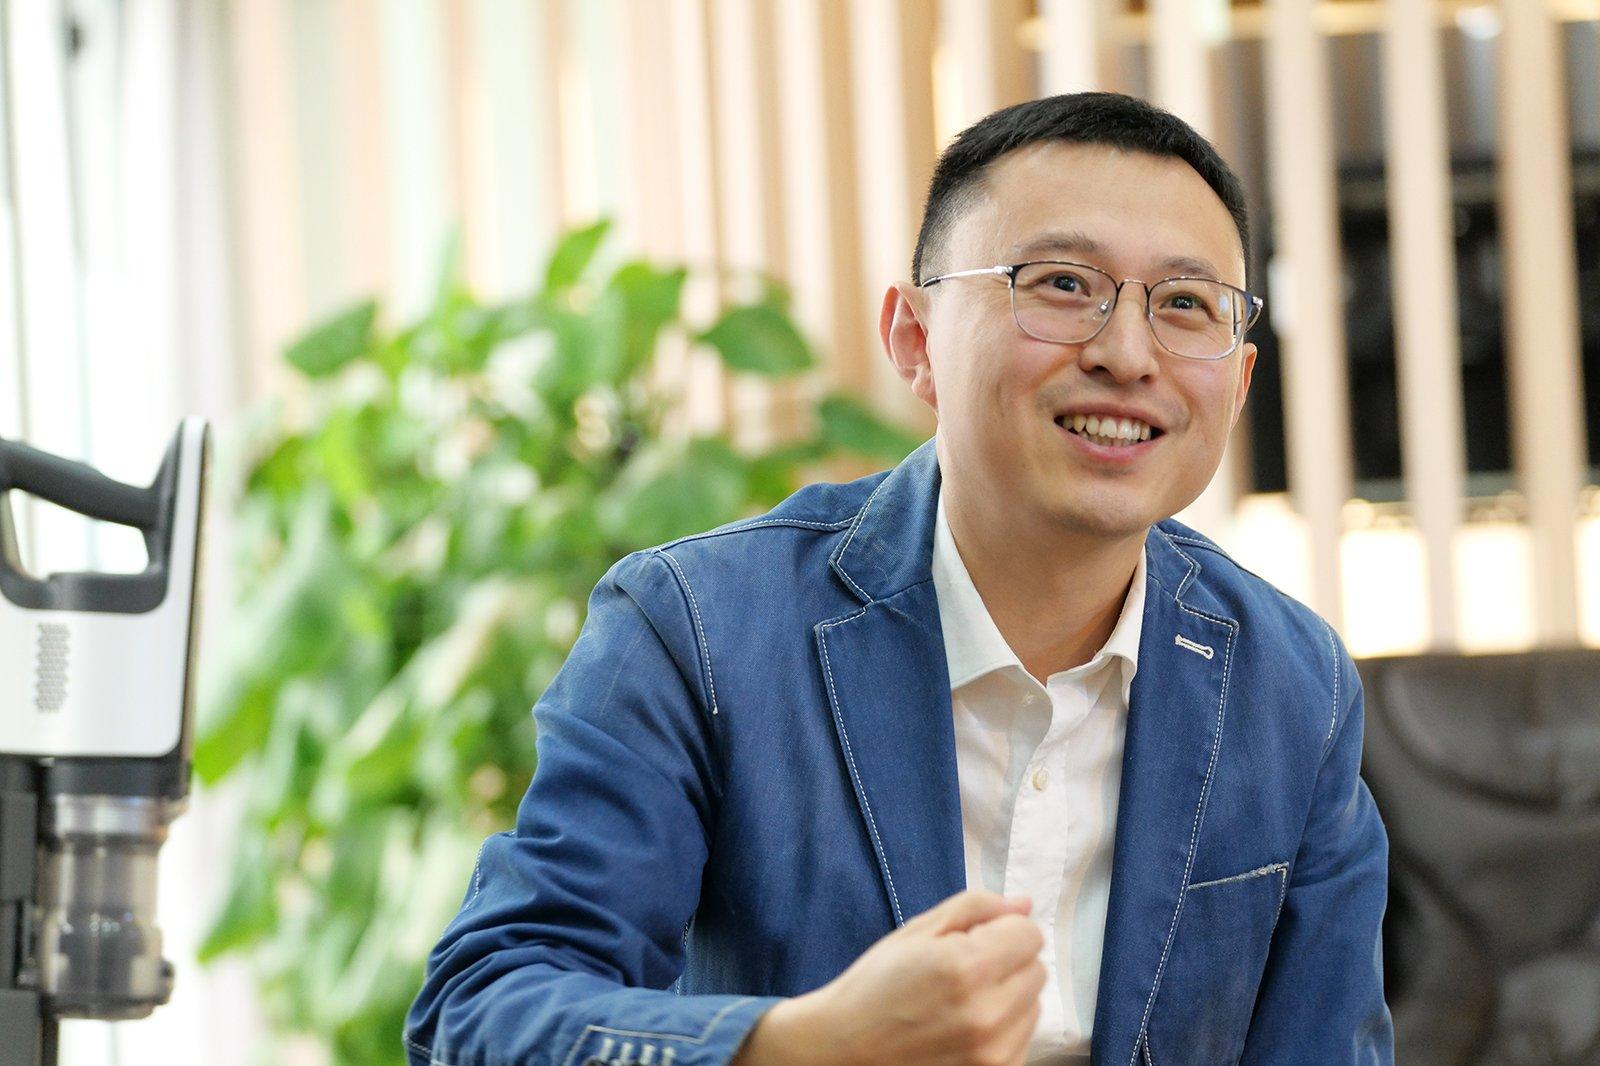 Photo: He Xin, Cofounder, HIPEE